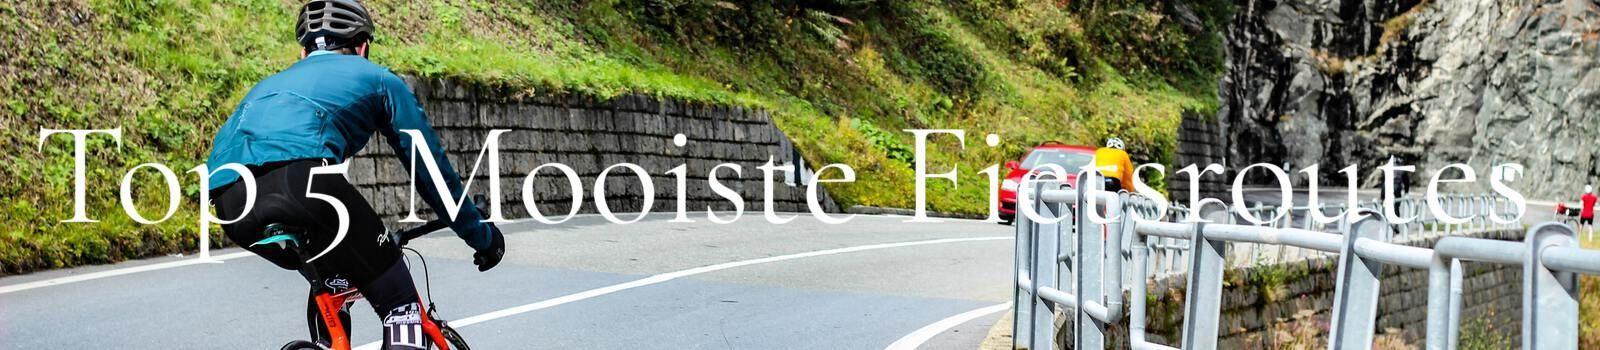 Top 5 mooiste fietsroutes